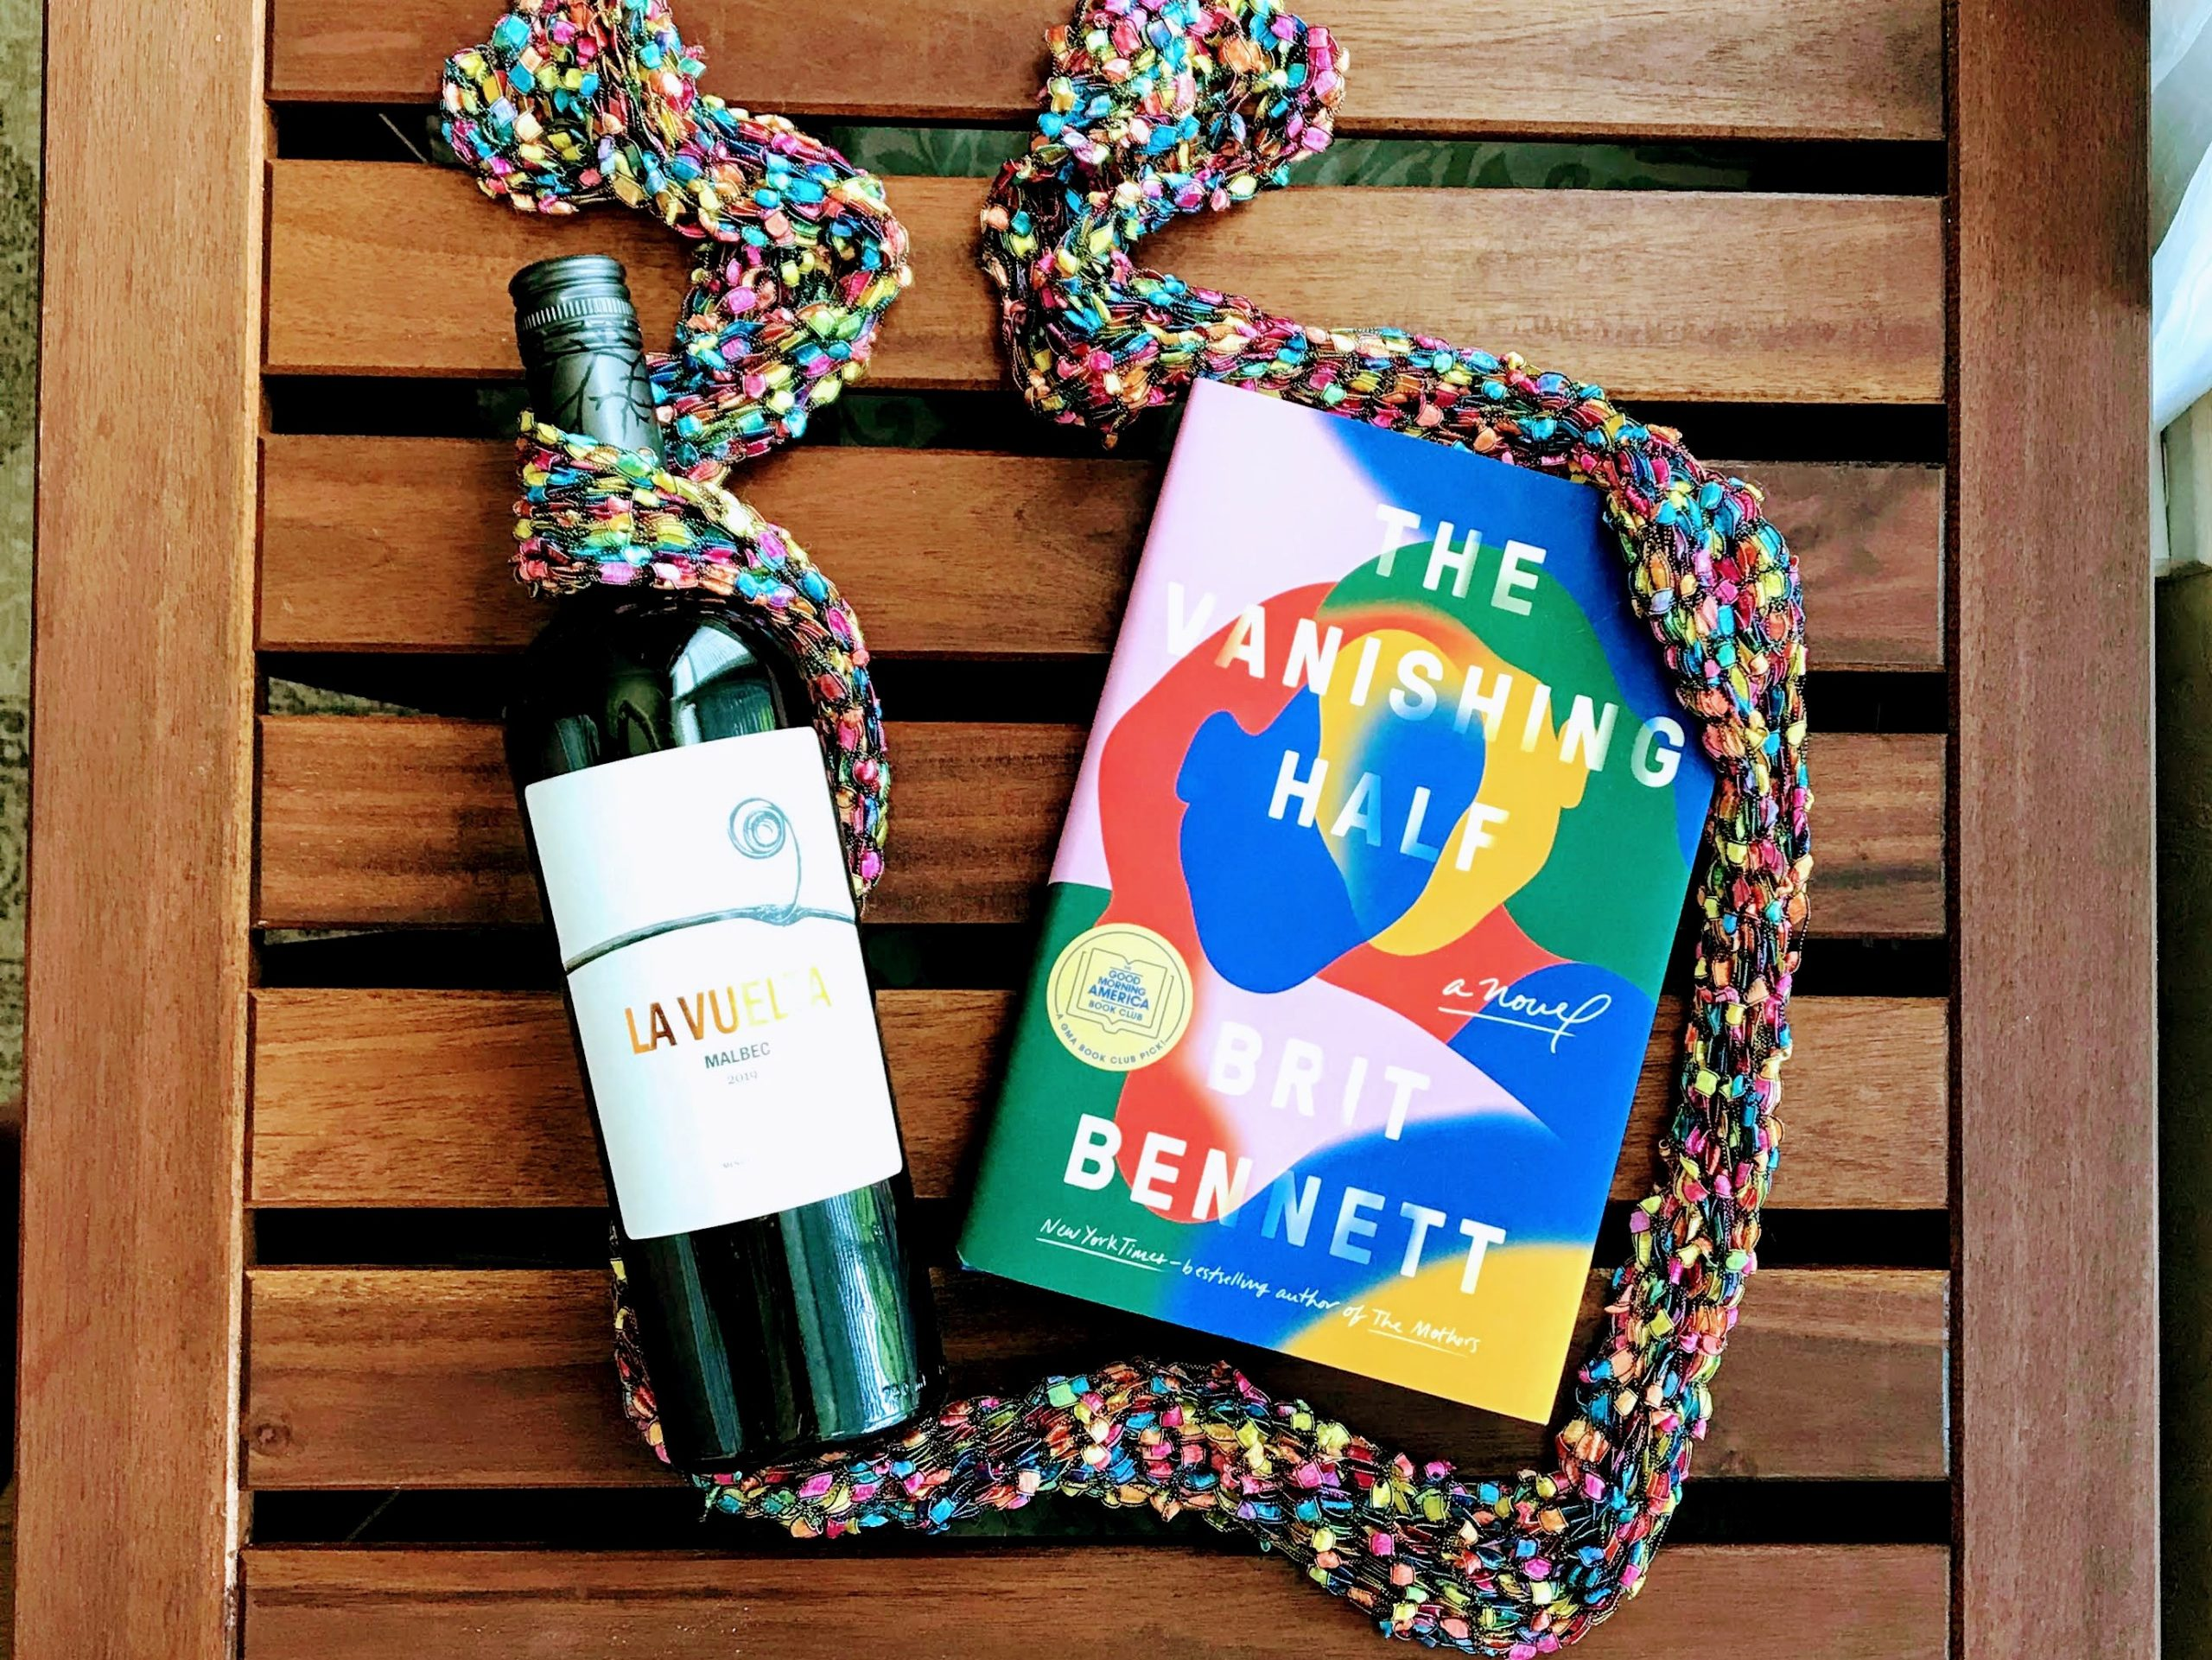 vanishing half brit bennett books bordeaux malbec wine